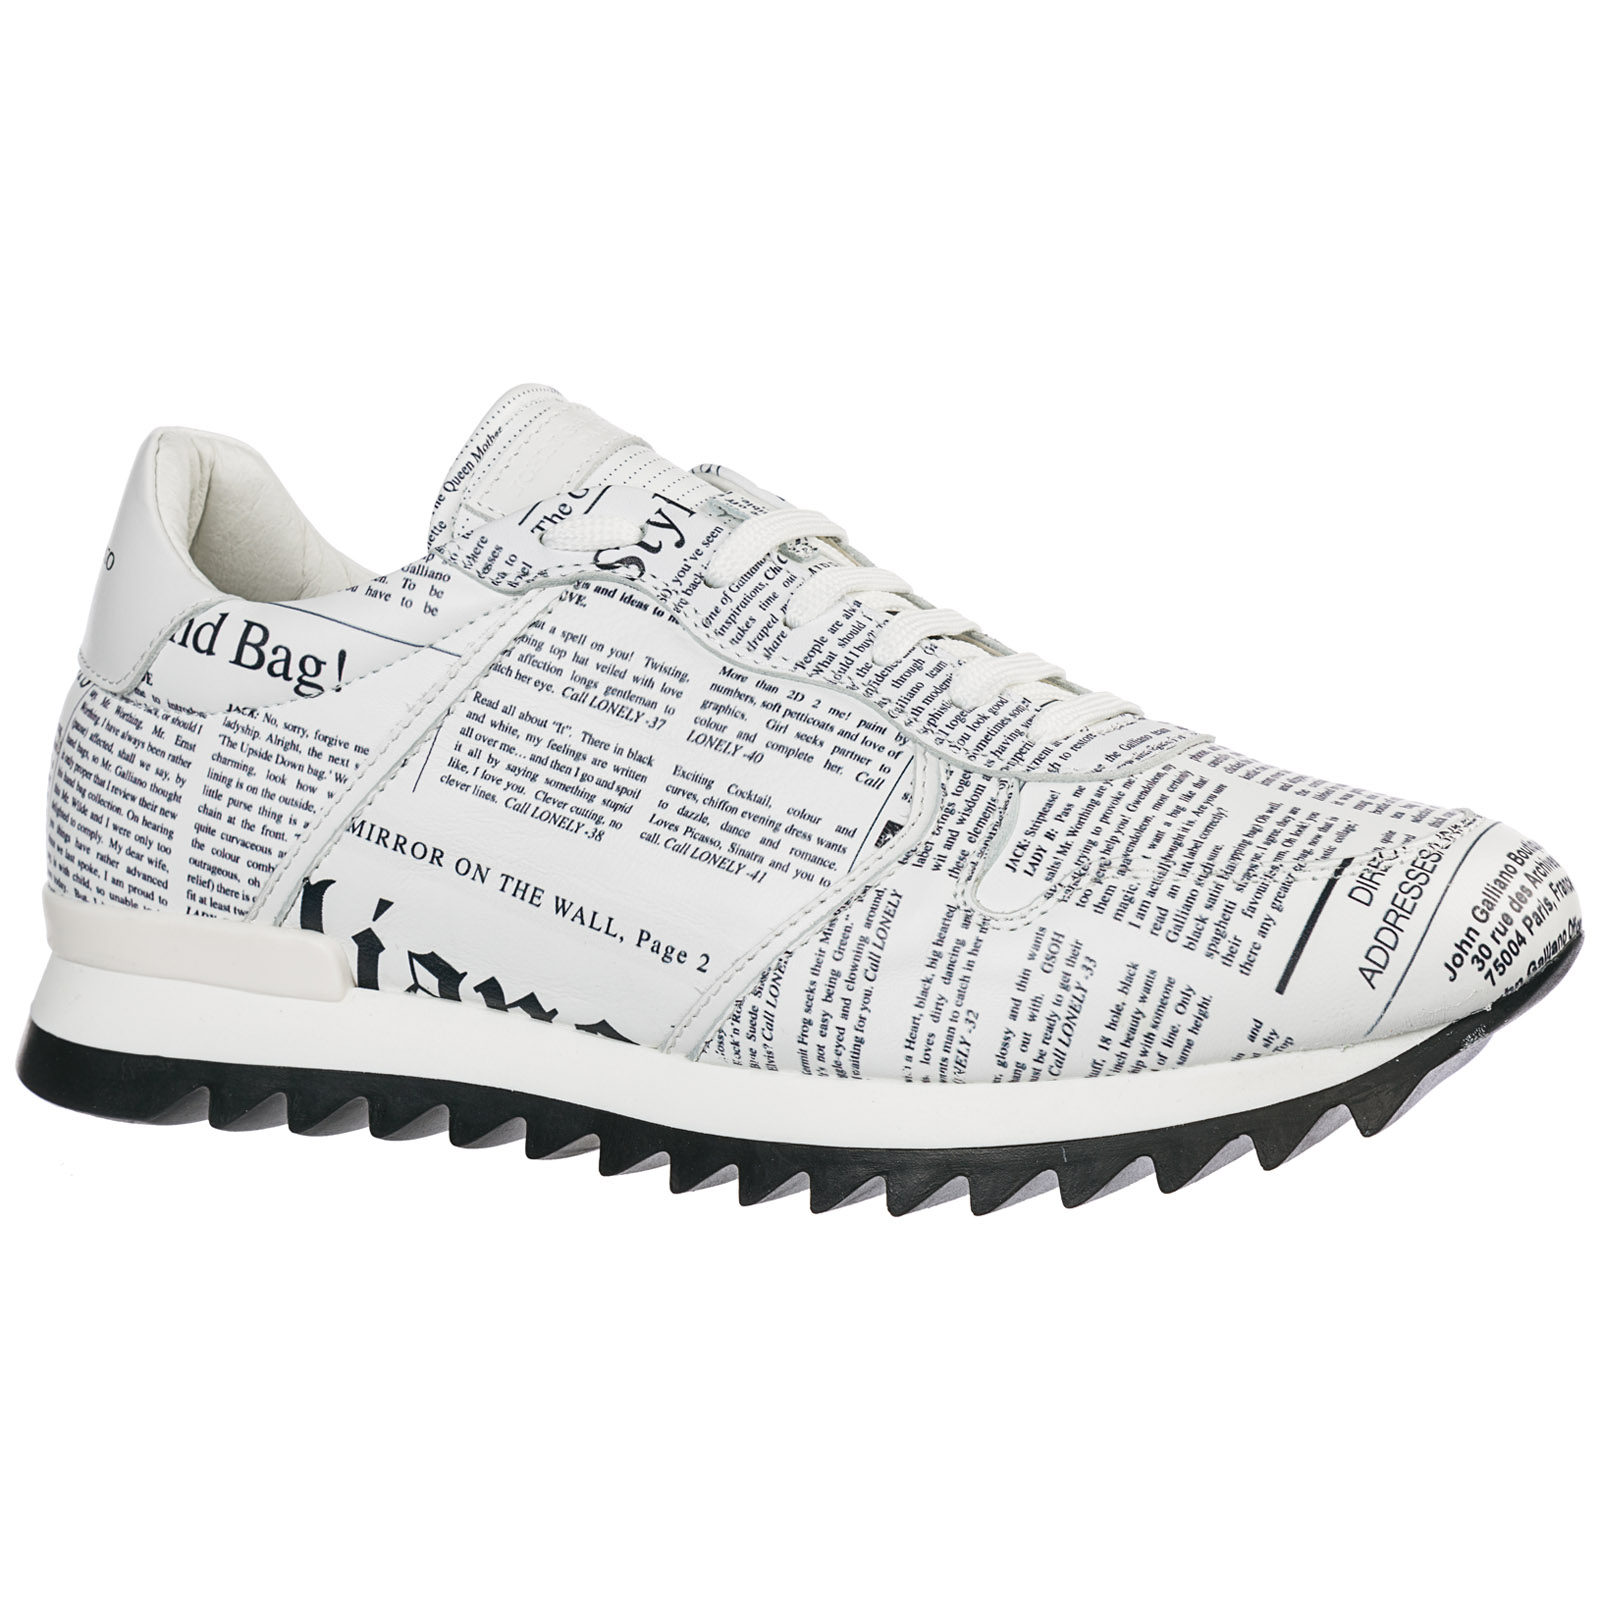 Schuhe Leder Sneakers Herrenschuhe Herren Herrenschuhe LARj5q34